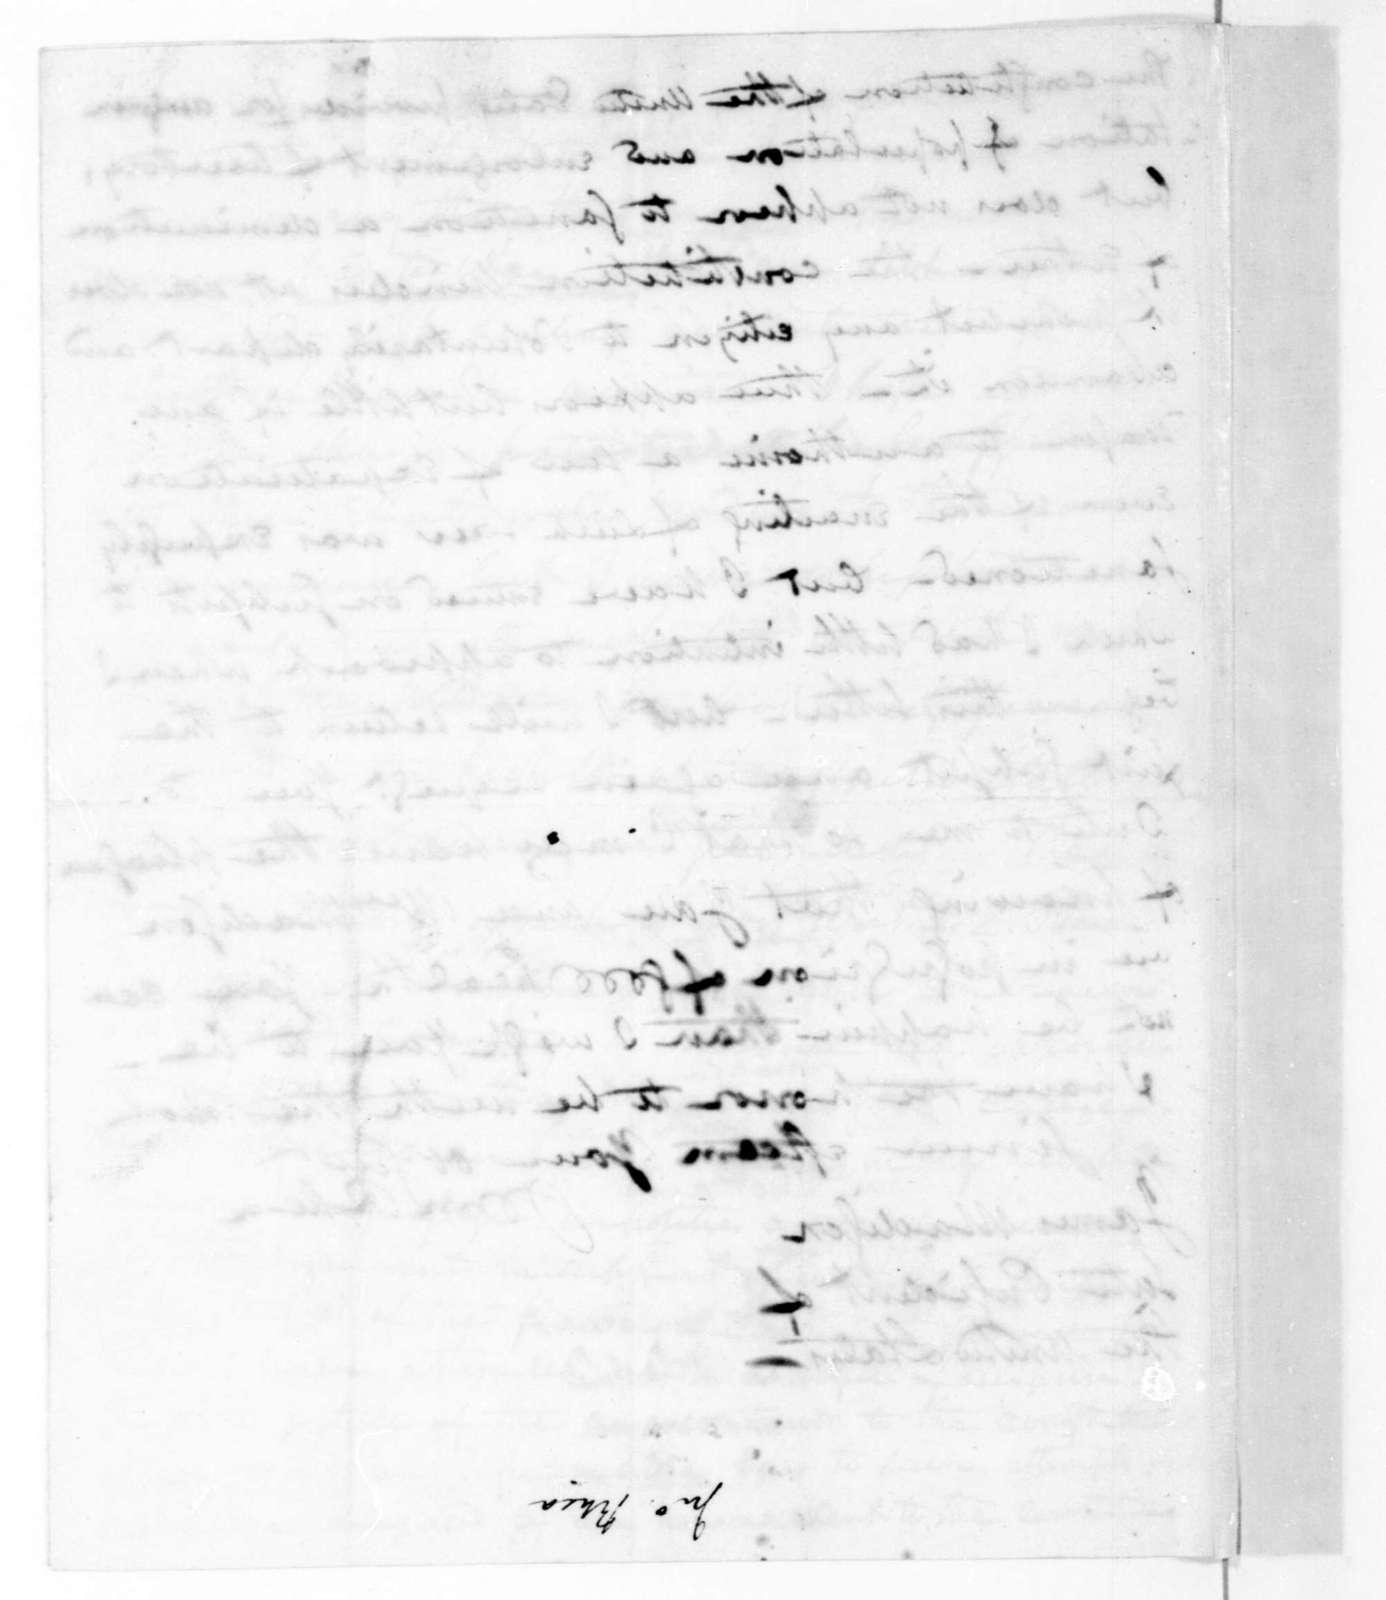 John Rhea to James Madison, March 30, 1816.